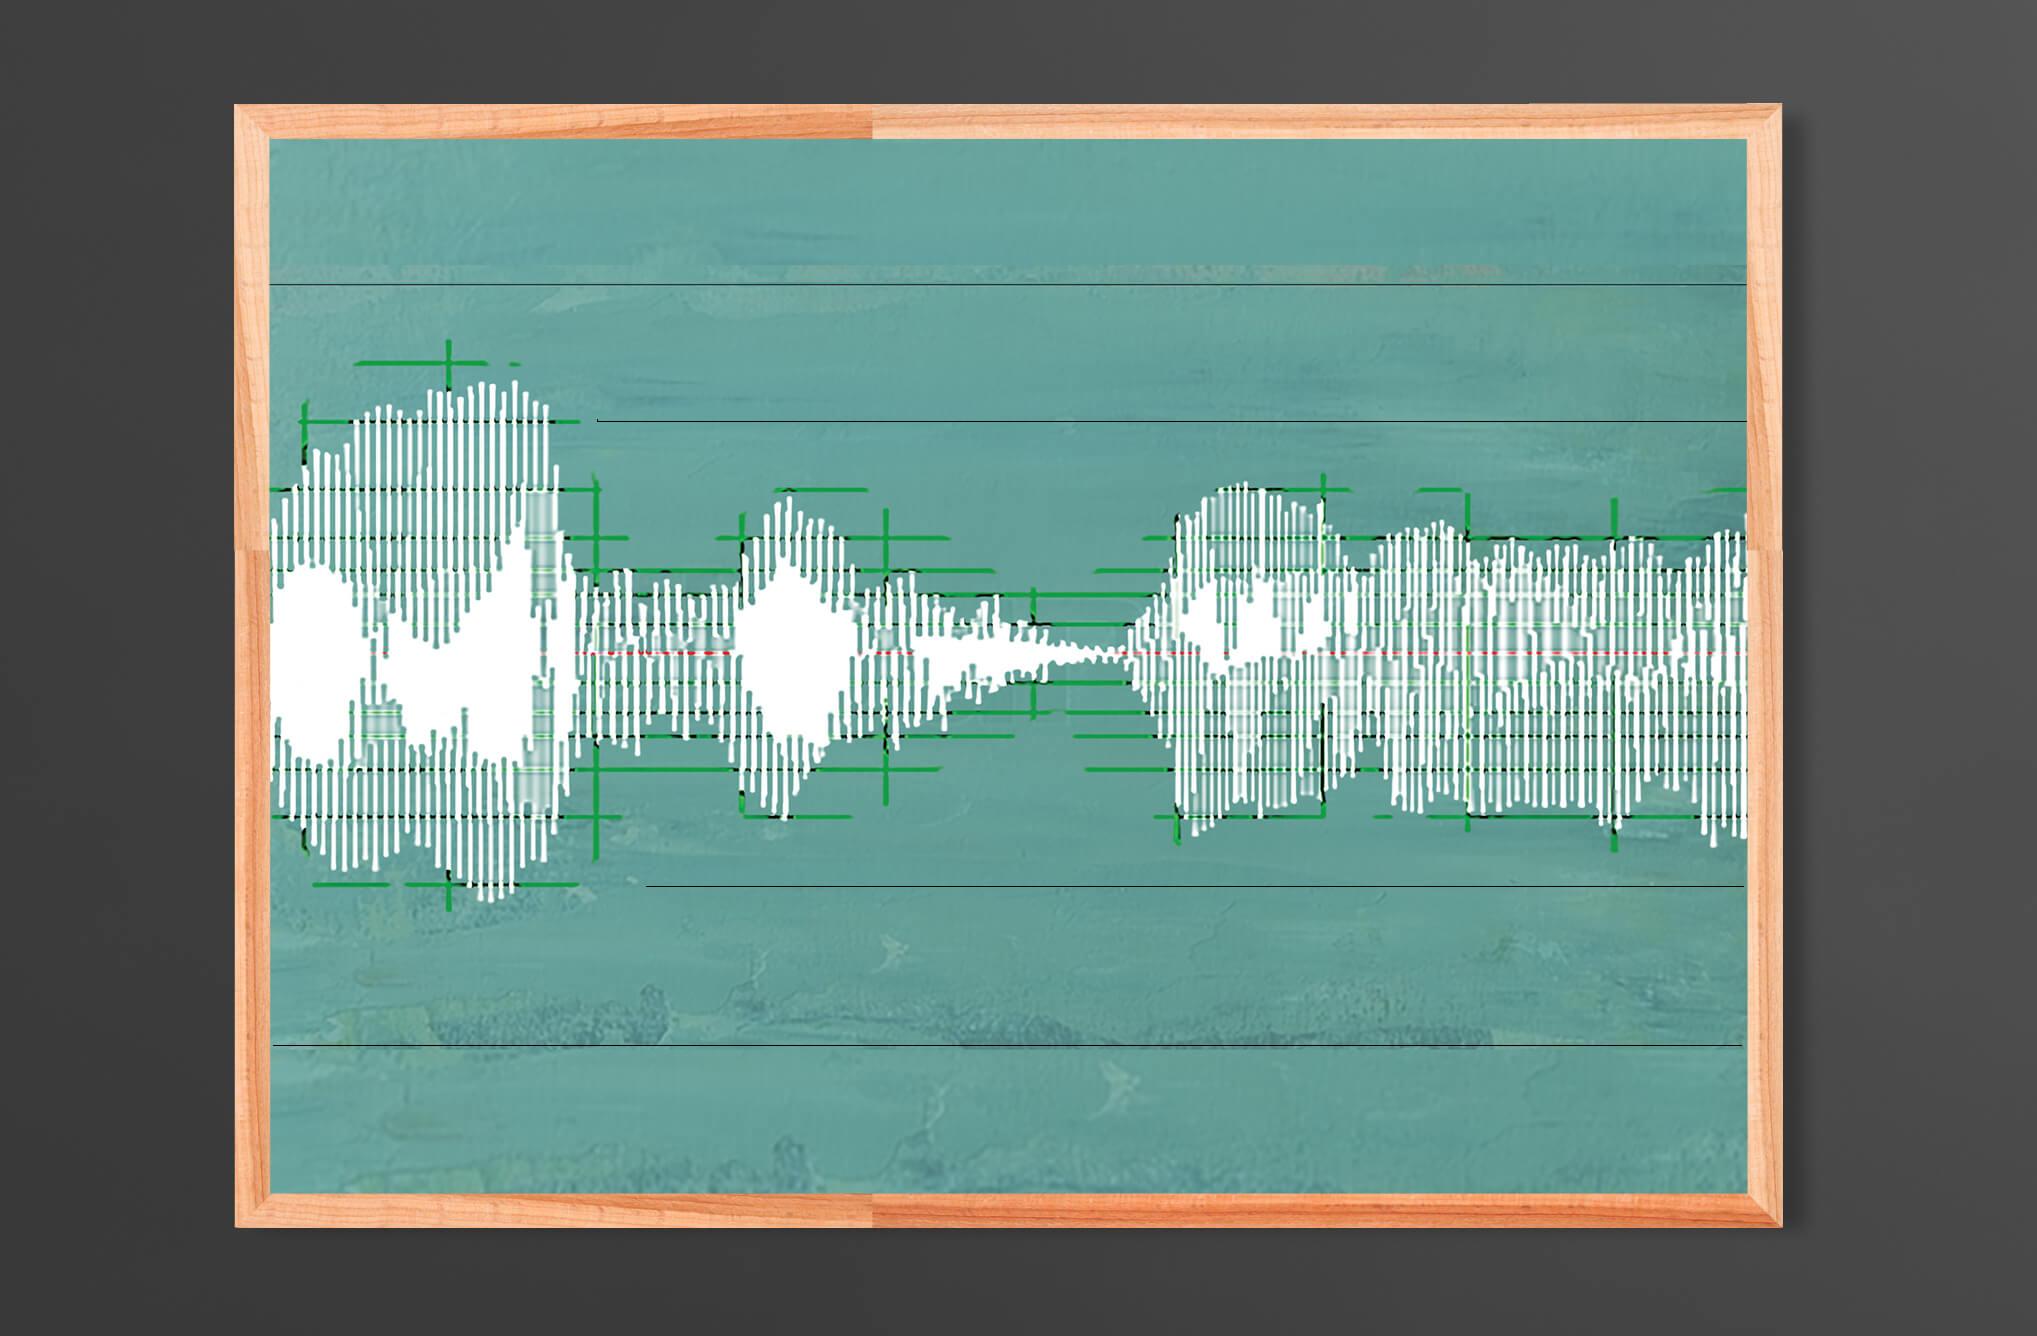 In Conversation  - Soundwaves Direct Print on Wood Unframed 70x50cm (landscape) | Price £130 Unframed.  Air Force Blue, Blue Gum, White, Calke Green, Chasm.